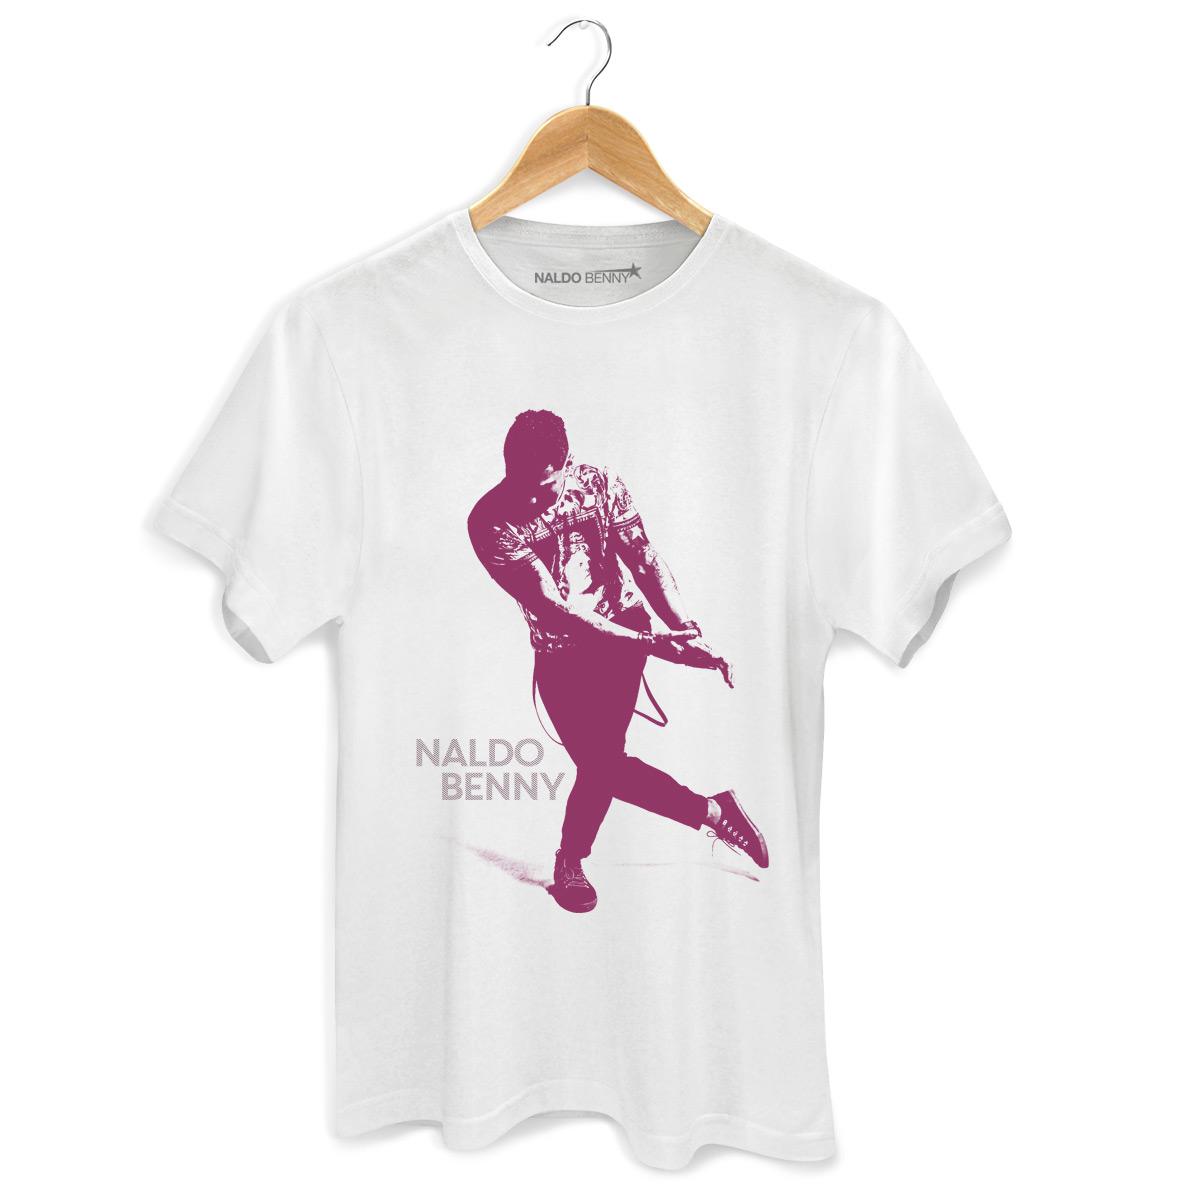 Camiseta Masculina Naldo Benny Se Joga Color